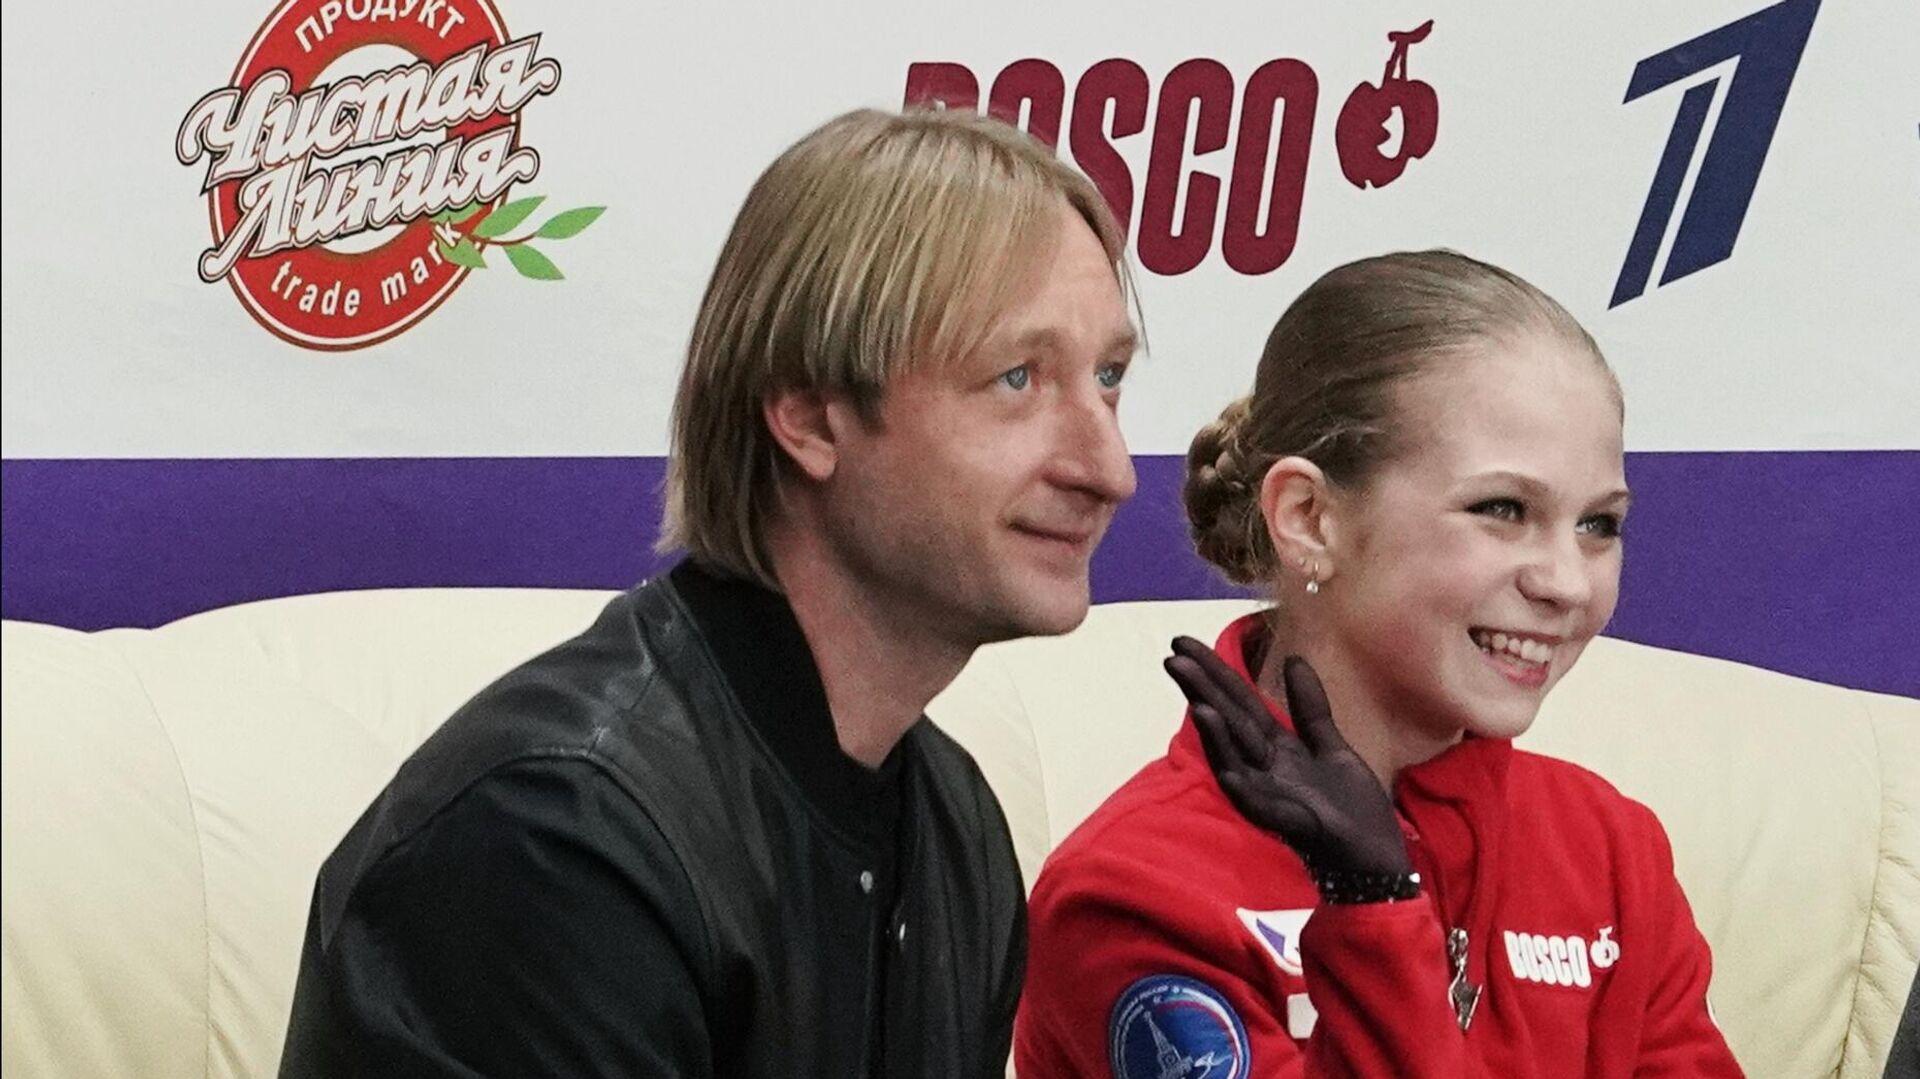 Александра Трусова и тренер Евгений Плющенко - РИА Новости, 1920, 20.11.2020